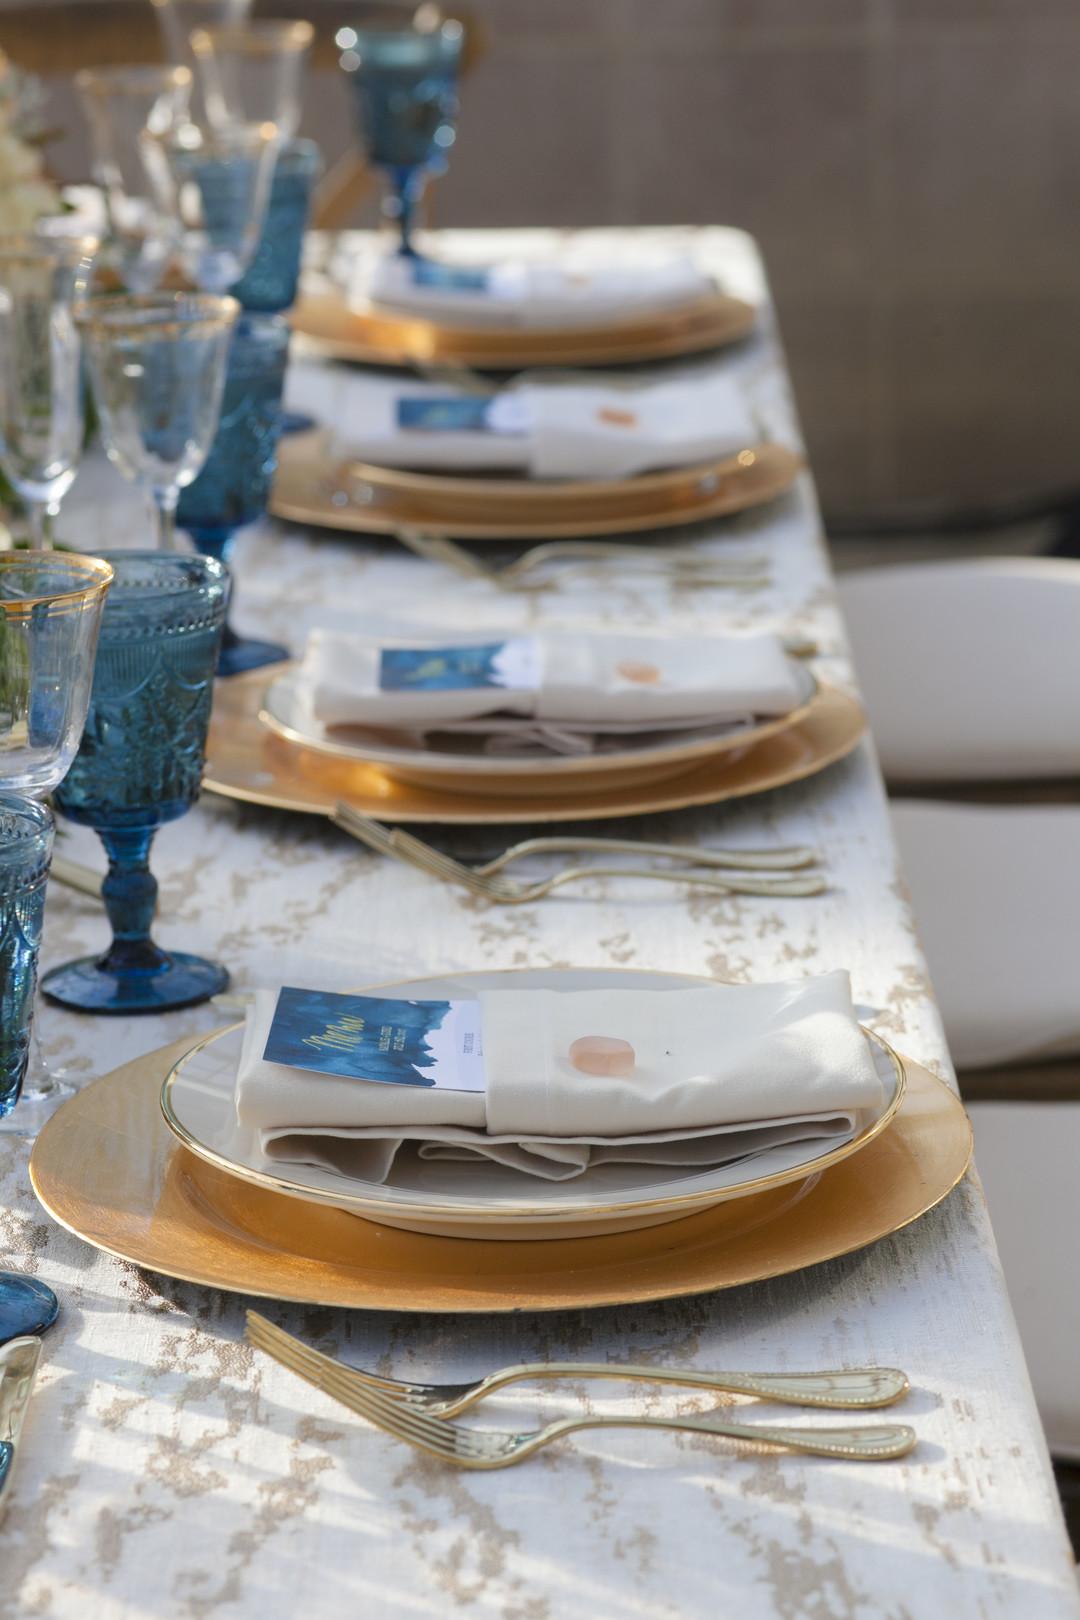 www.santabarbarawedding.com | Venue: Dos Pueblos Ranch | Photographer: ByCherry Photography | Event Designer: Elan Event Rentals | Tablescape